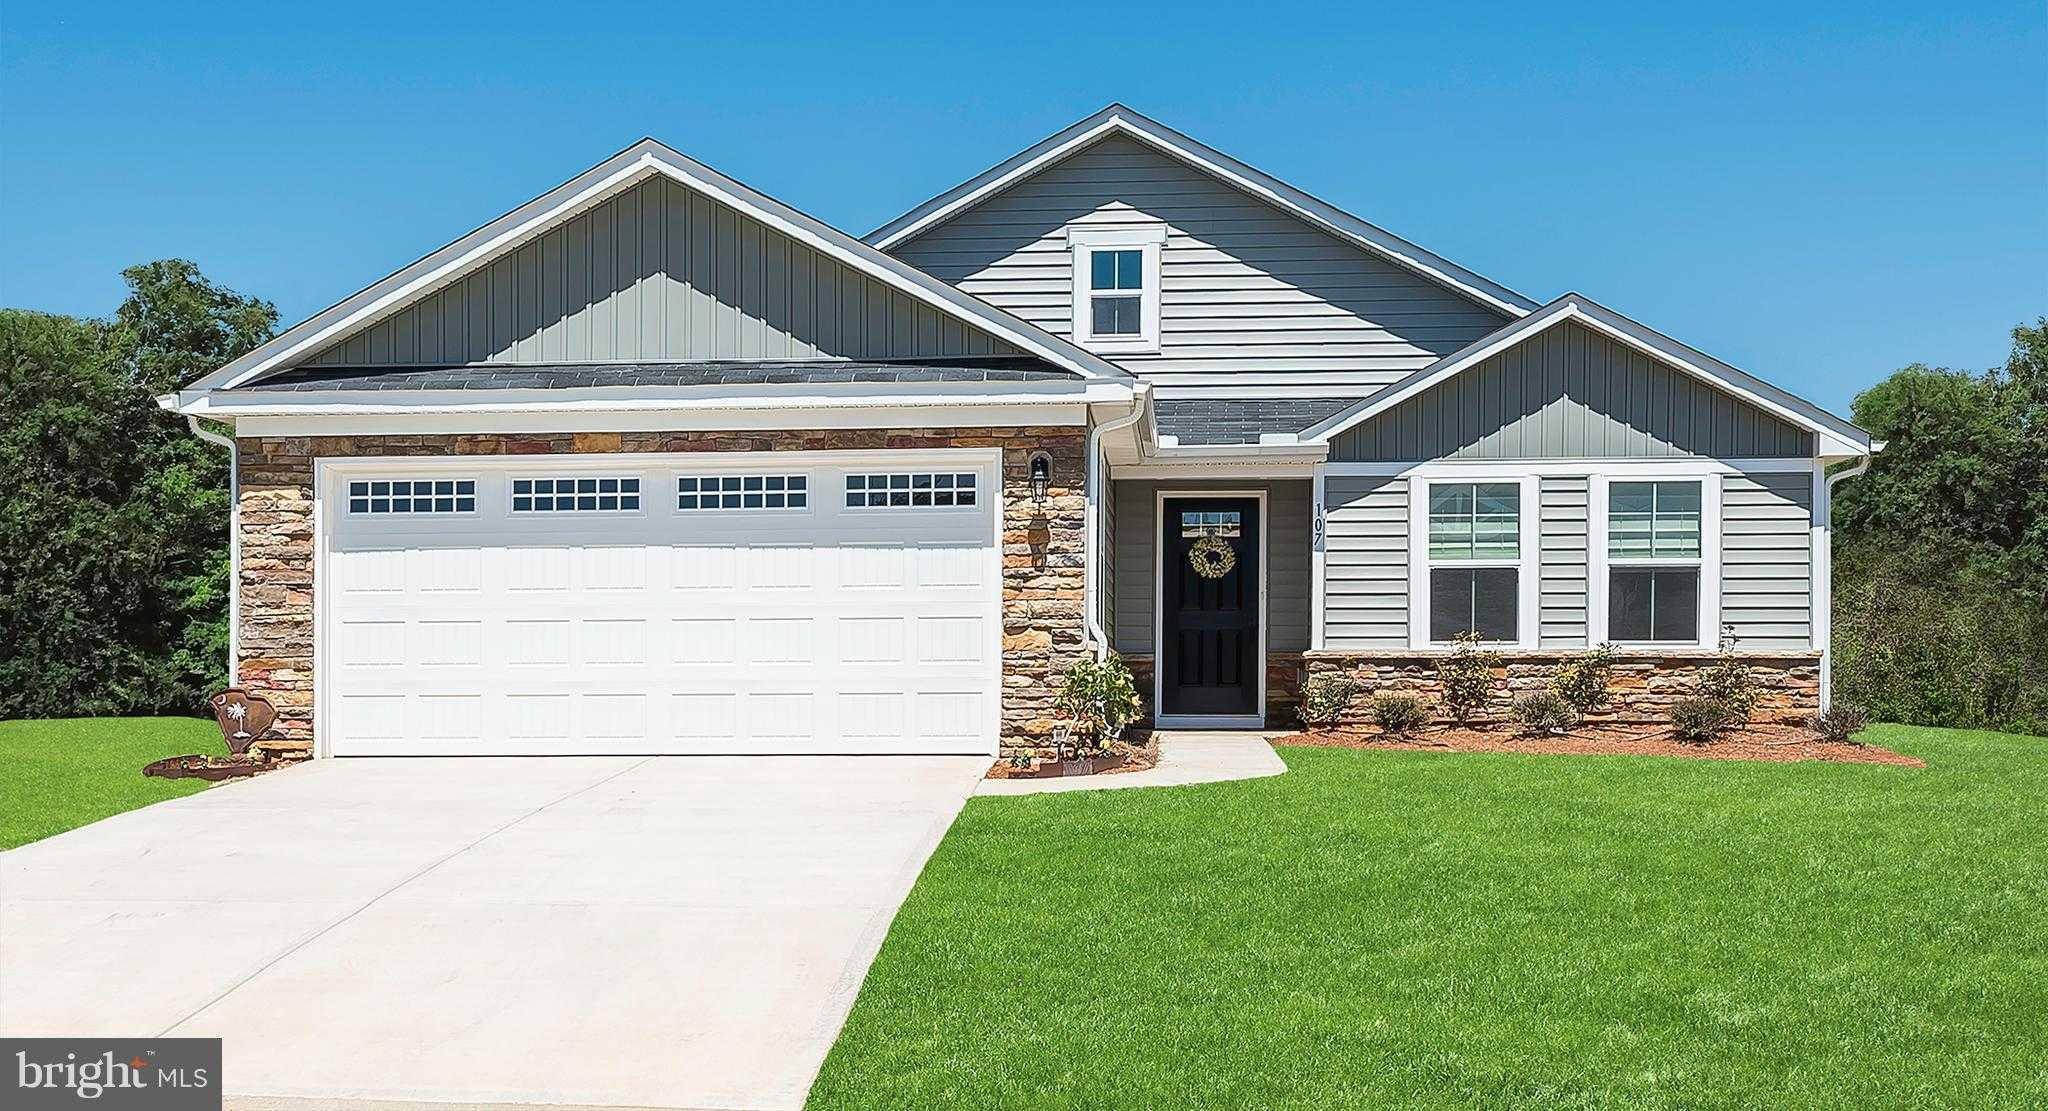 $275,290 - 3Br/2Ba -  for Sale in Arcadia Springs, Martinsburg